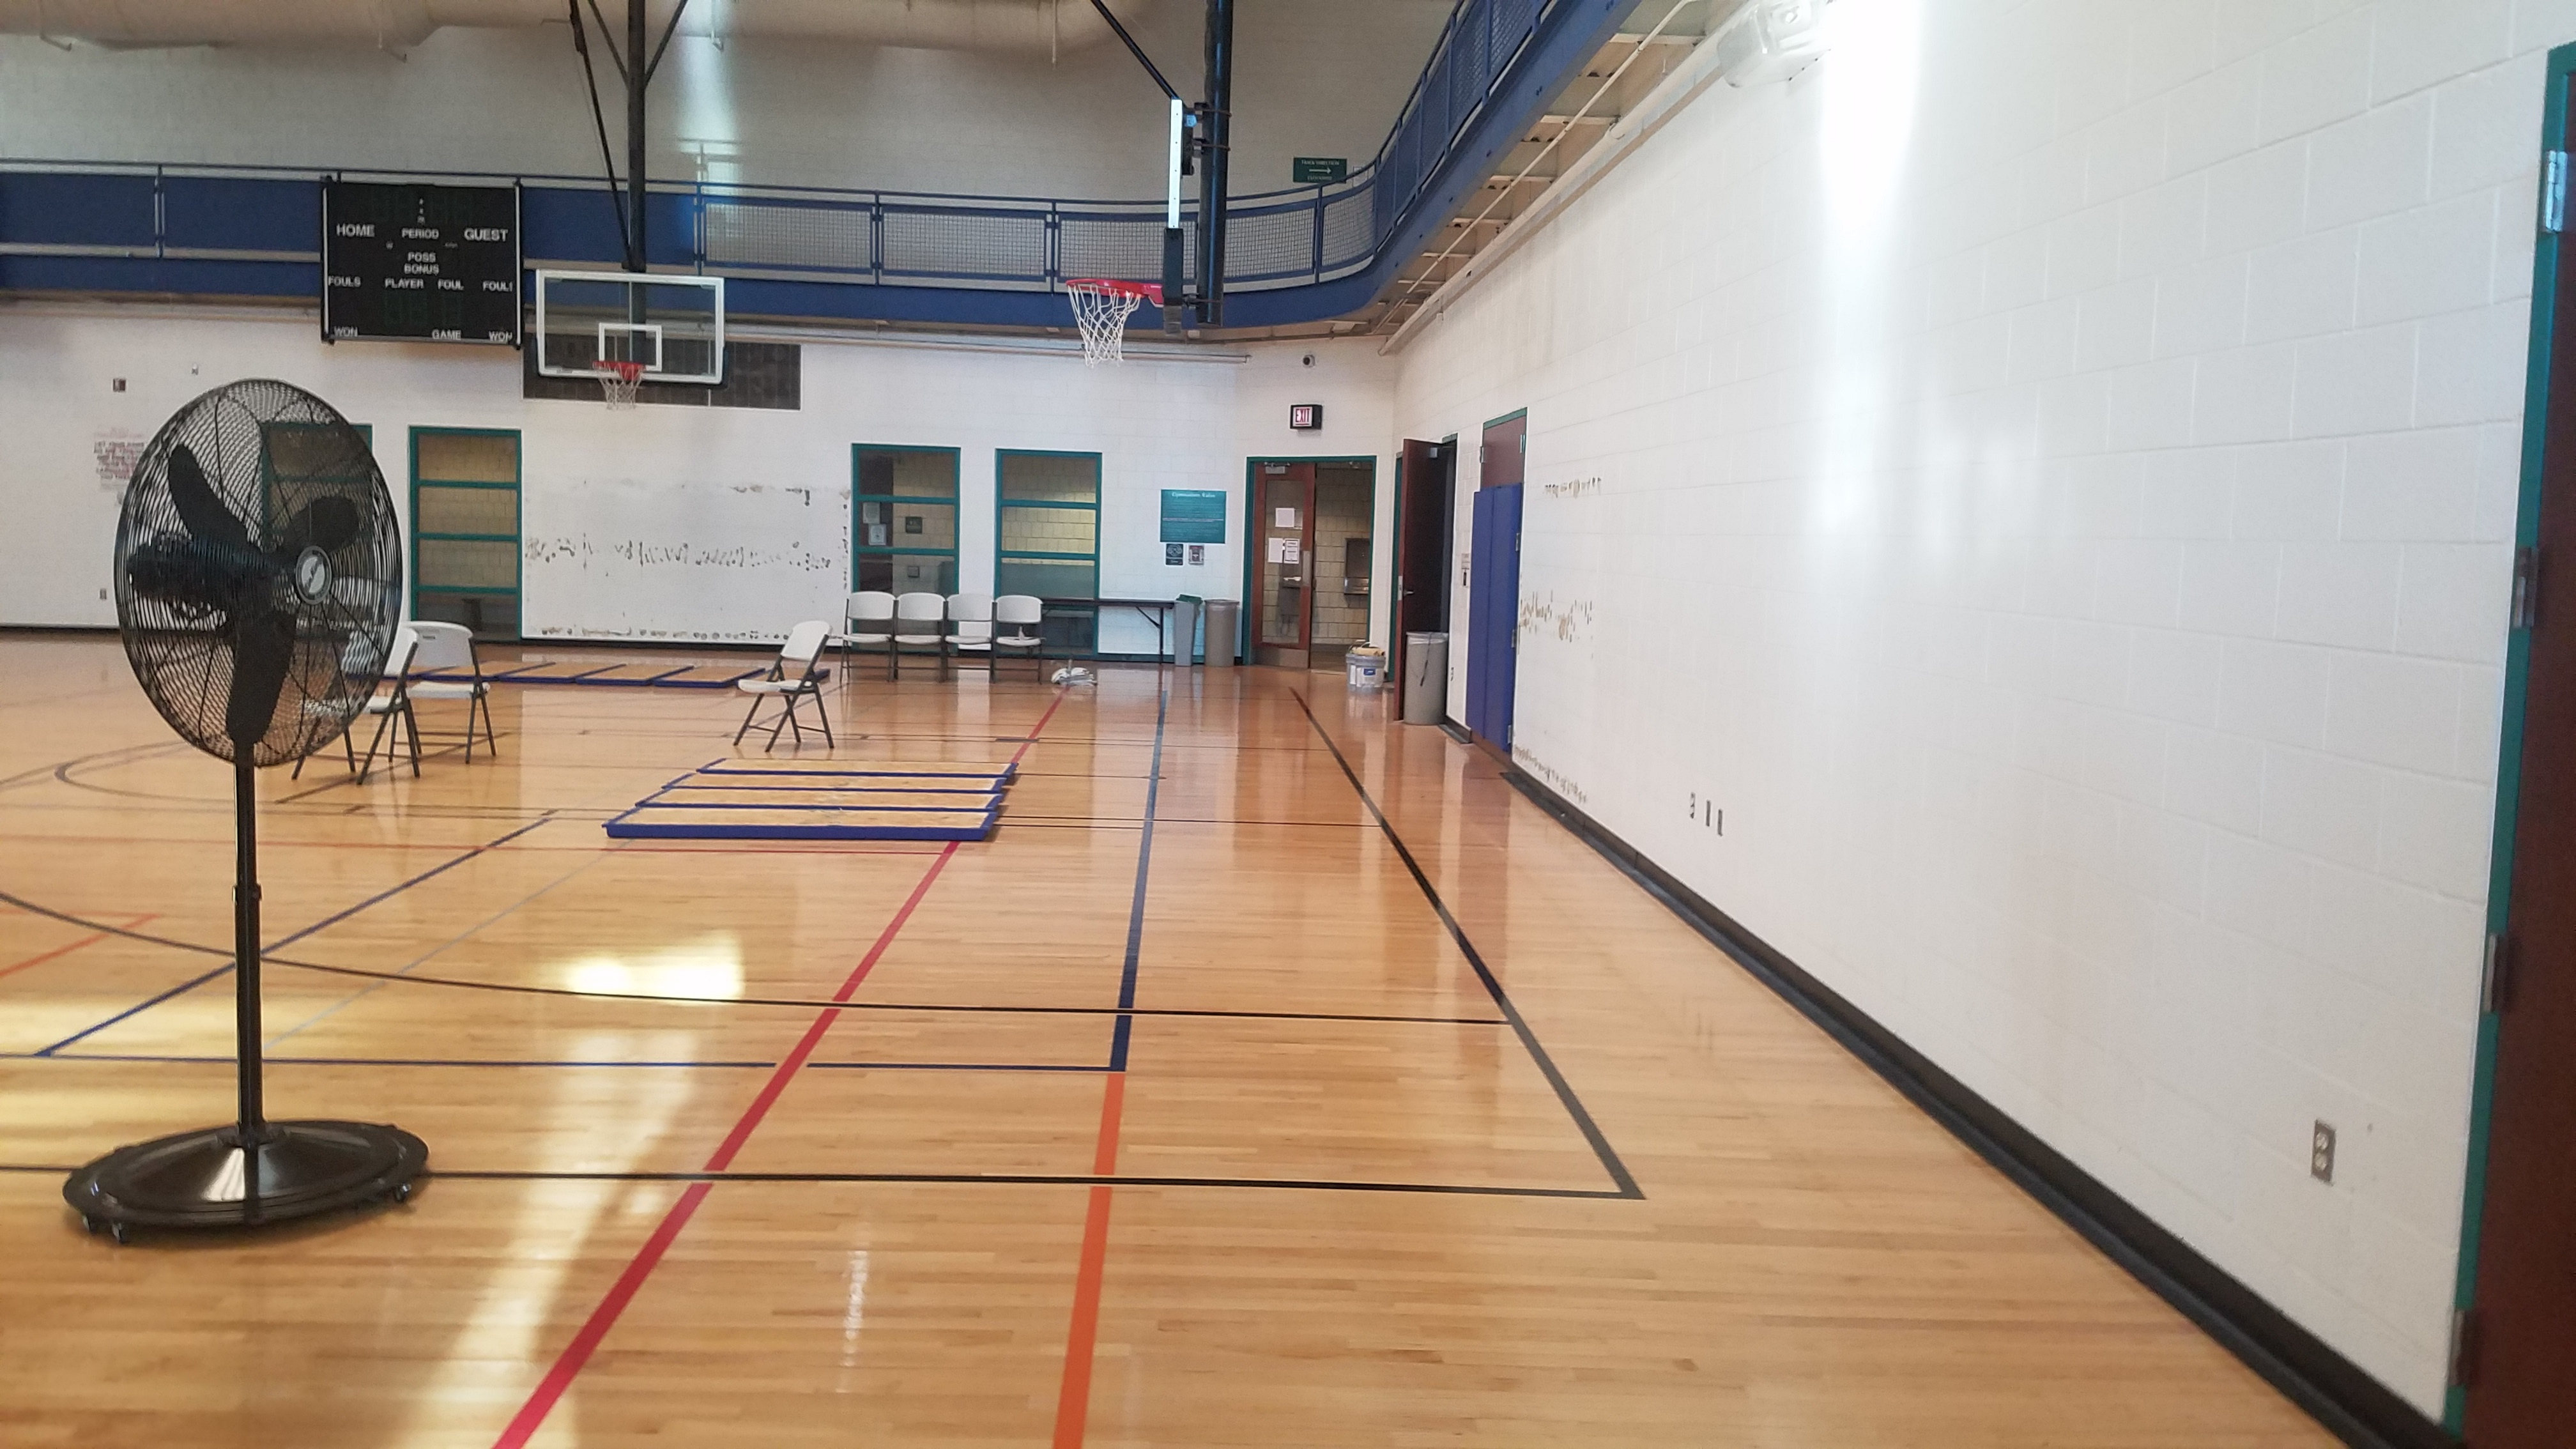 gym before